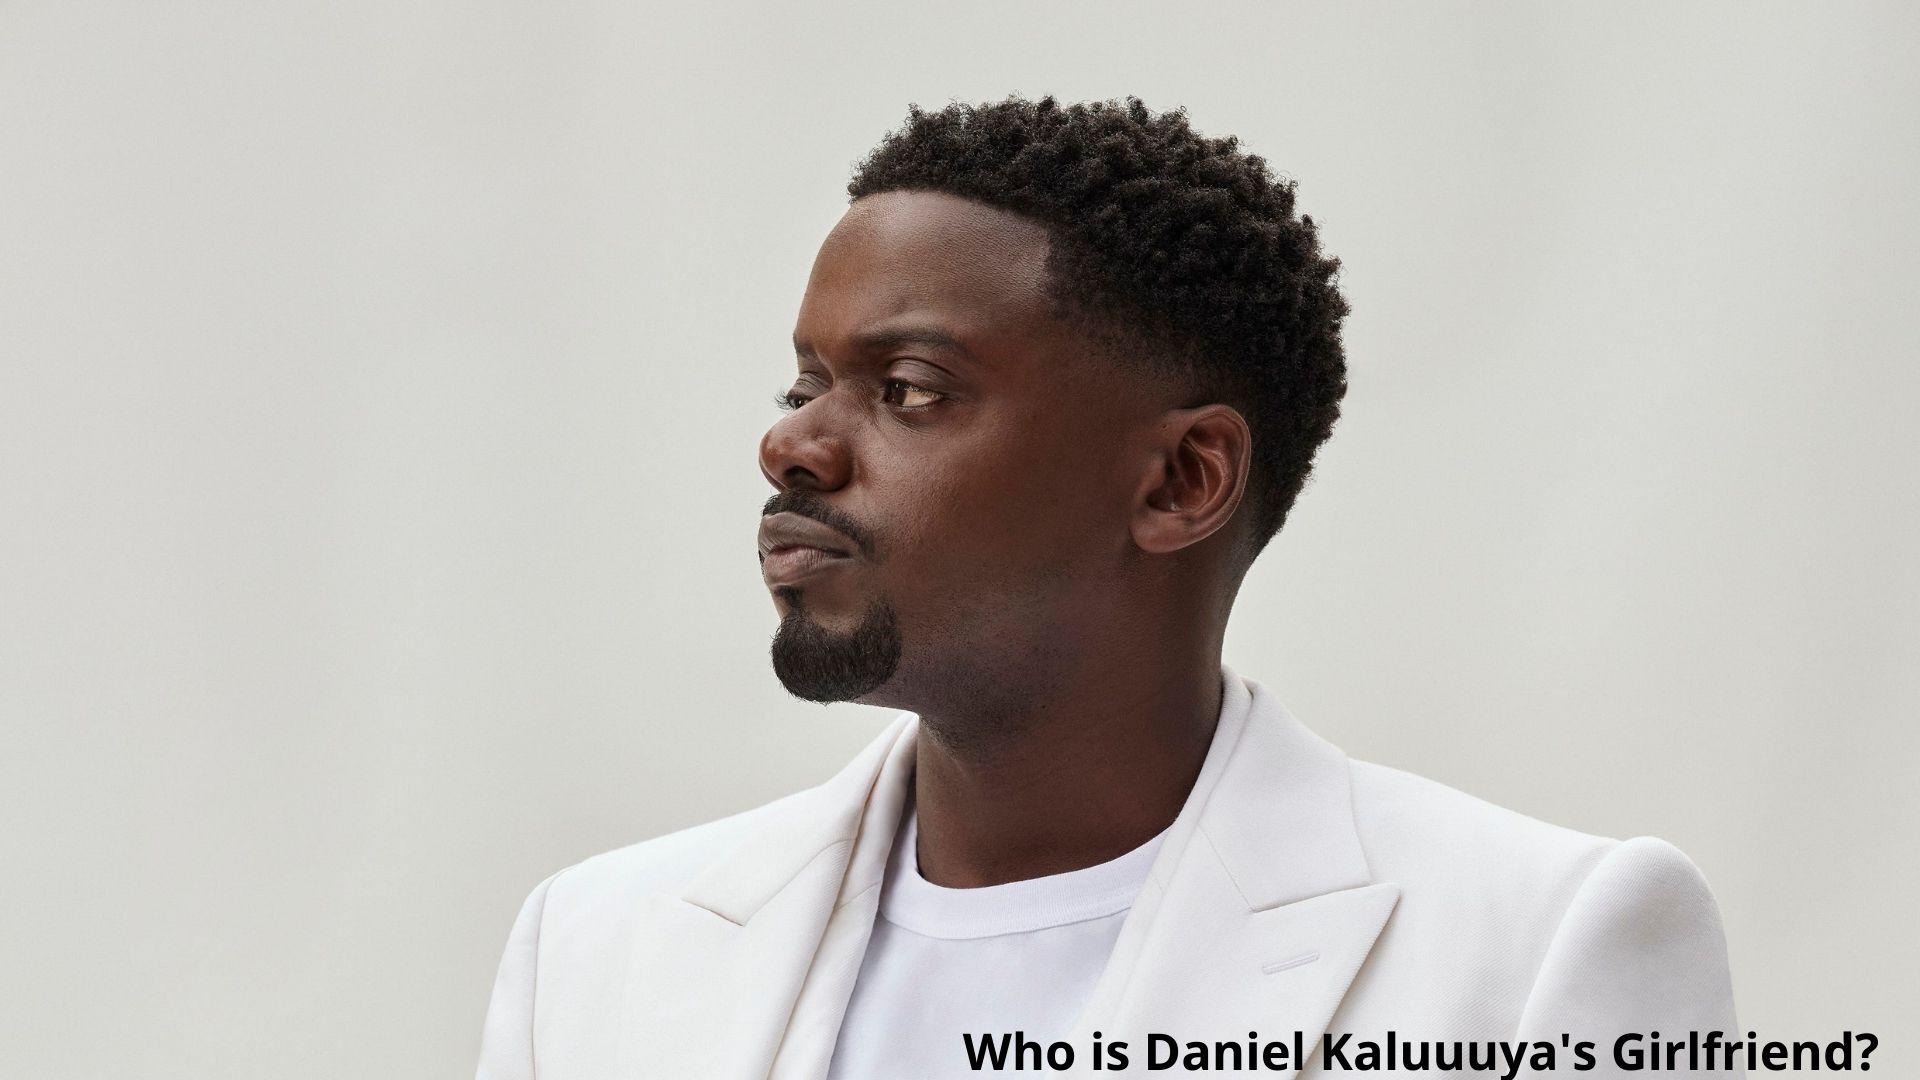 Who is Daniel Kaluuya's Girlfriend